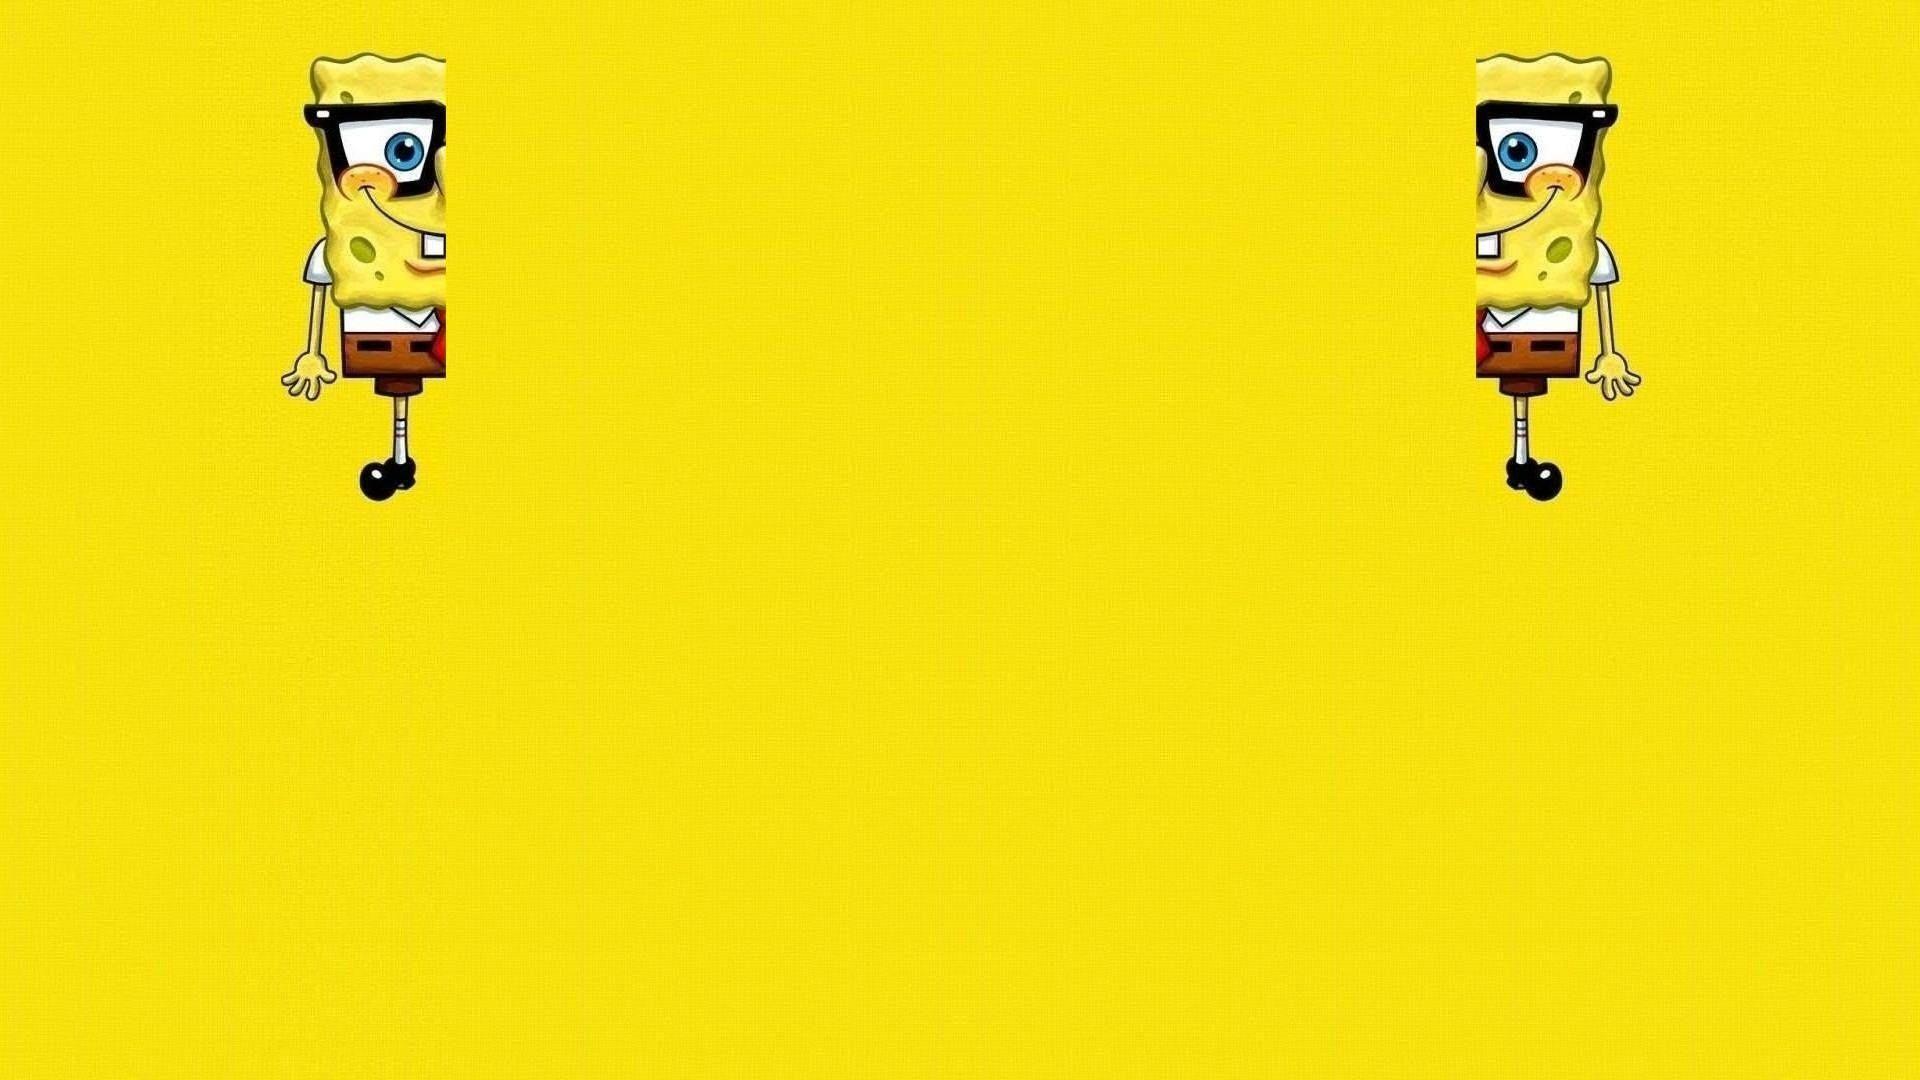 Gambar lucu bergerak ppt gambucu for Spongebob powerpoint template